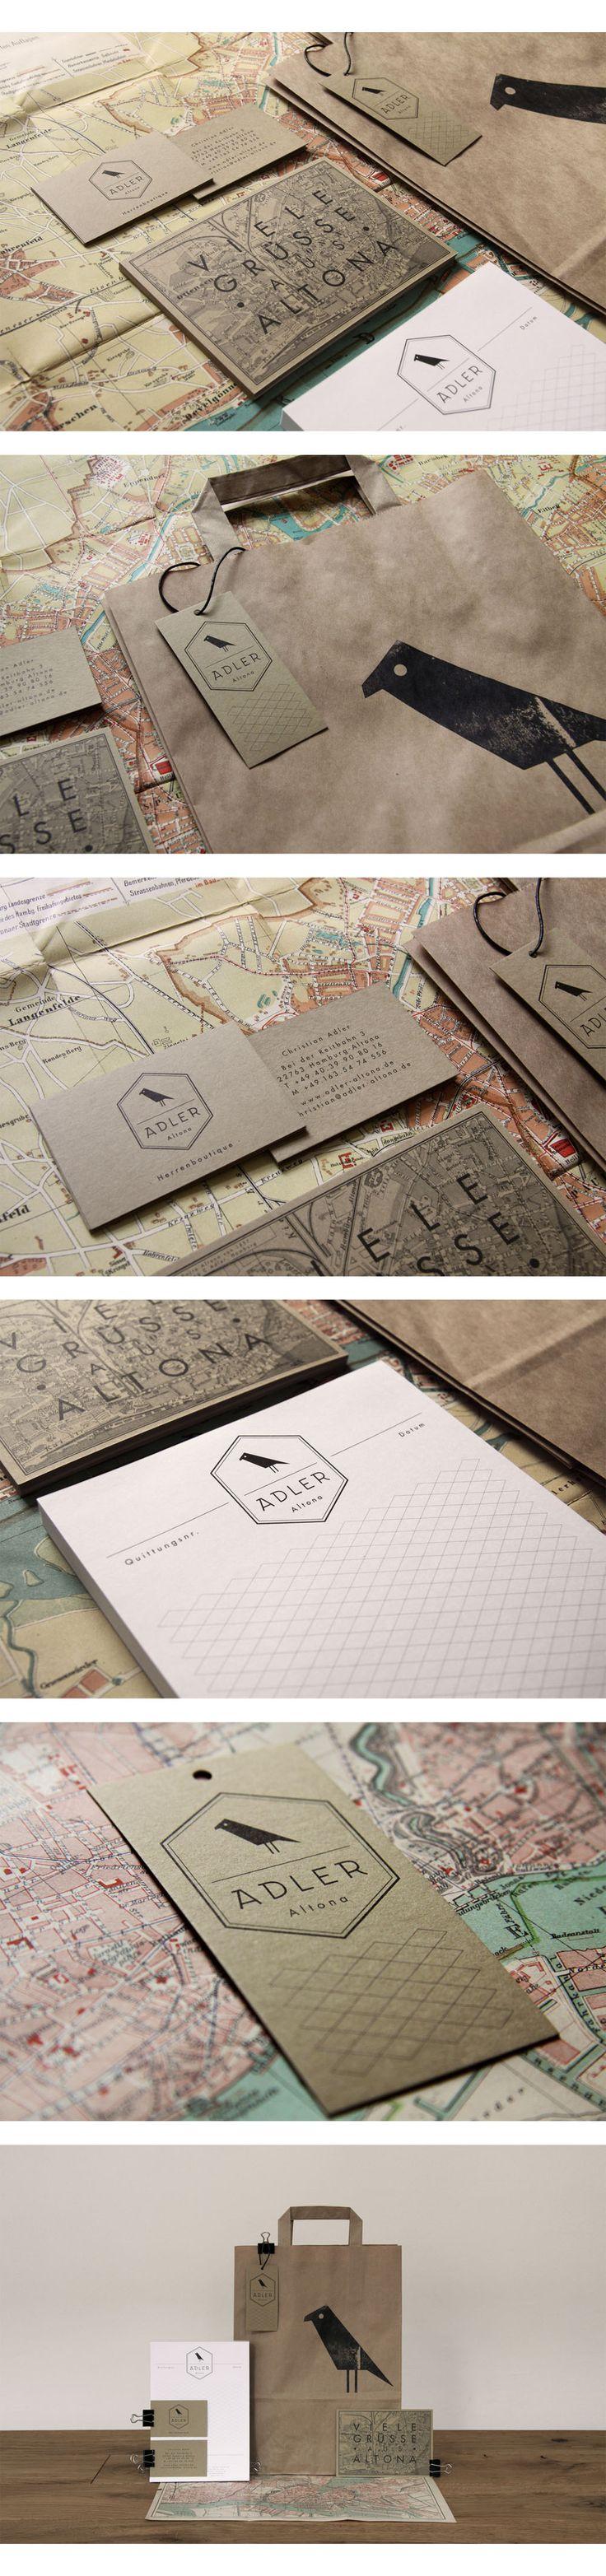 Adler Altona – Herrenboutique | Brand Identity                                                                                                                                                     Mehr